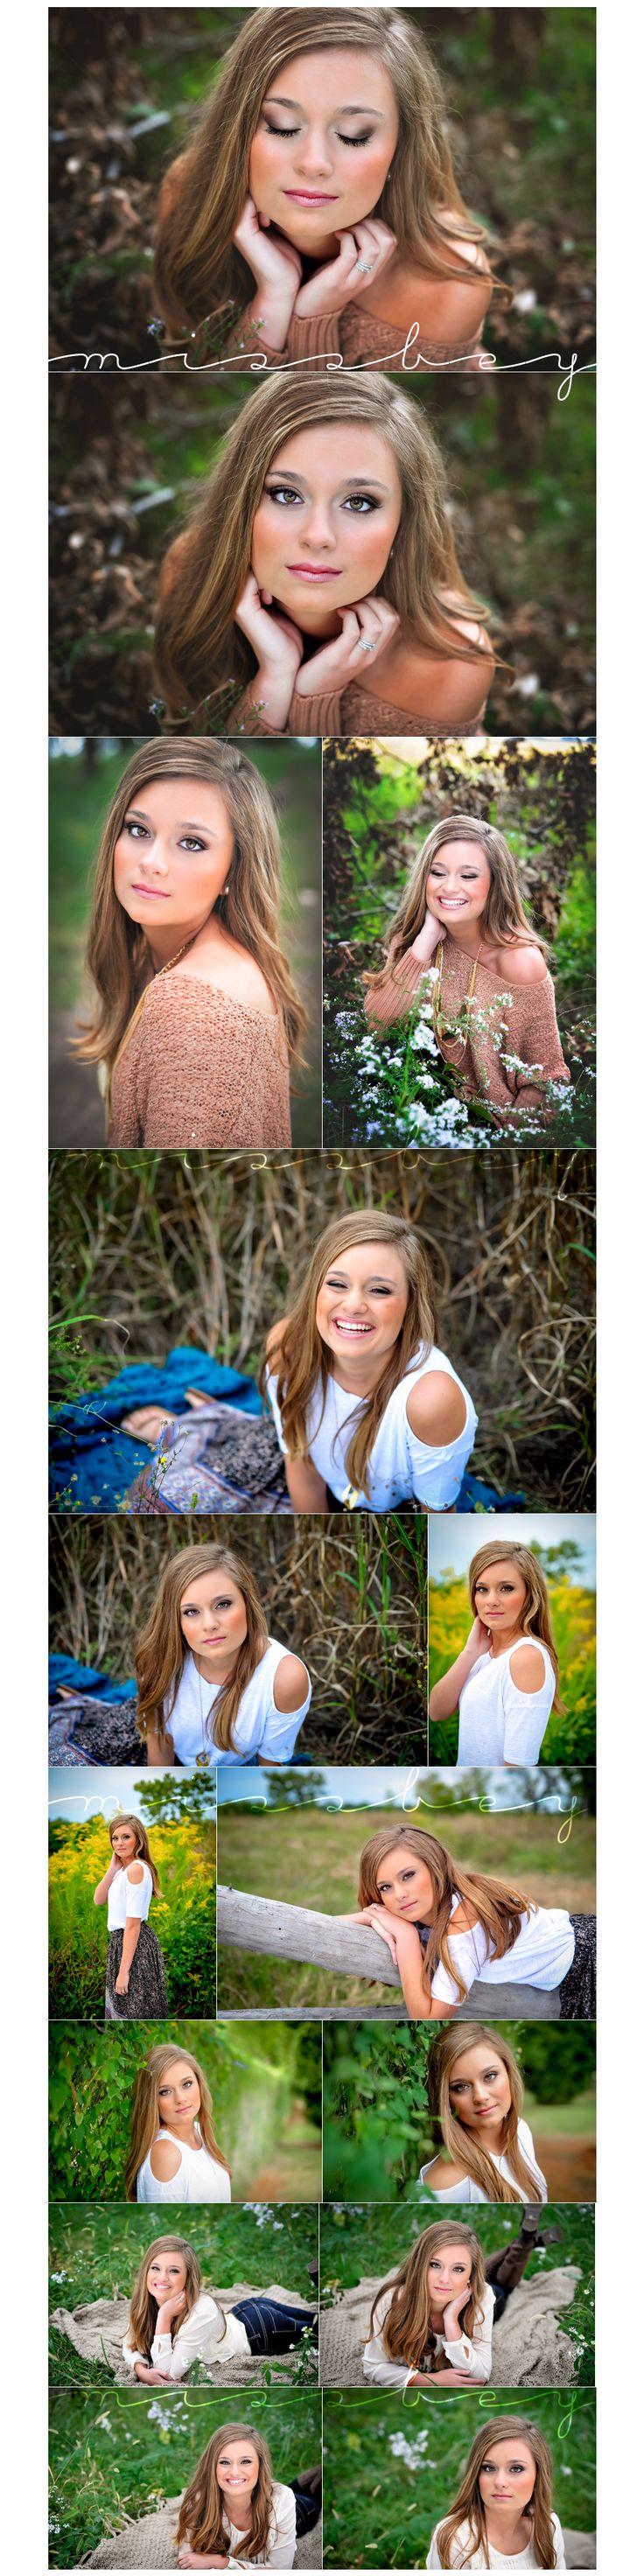 2014 #senior #Girl #posing